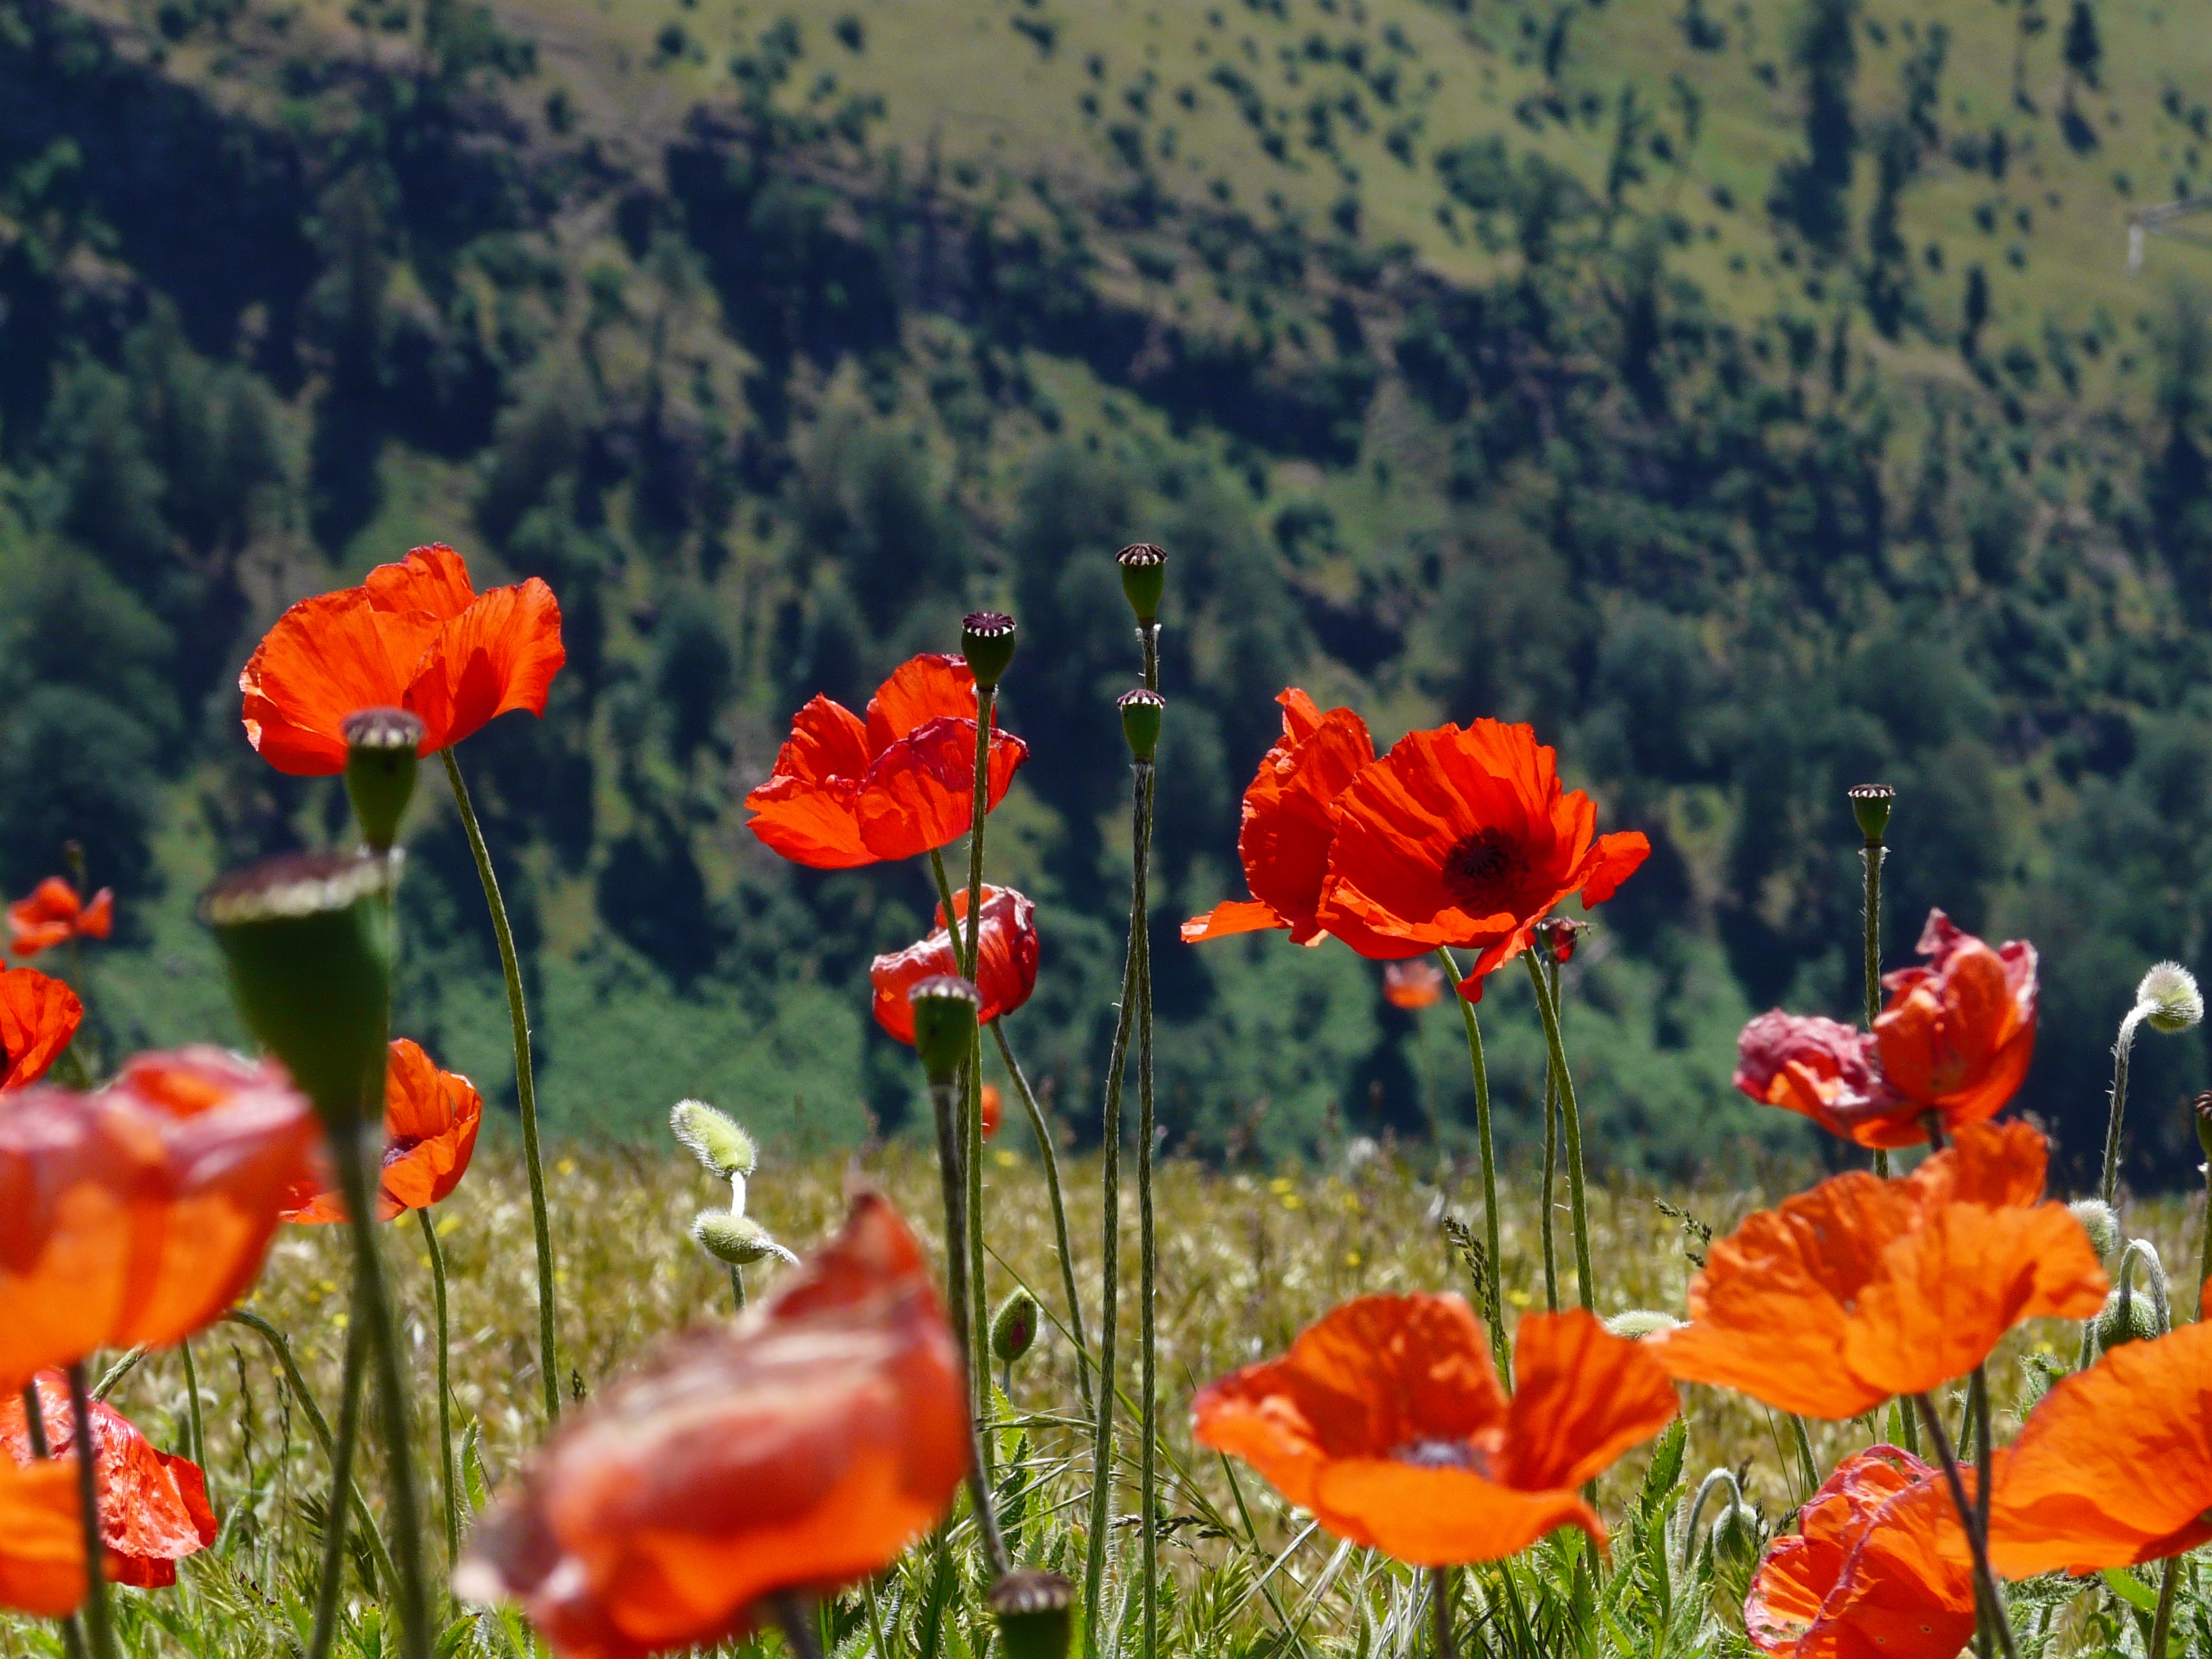 Red poppy flowers against a green field backdrop